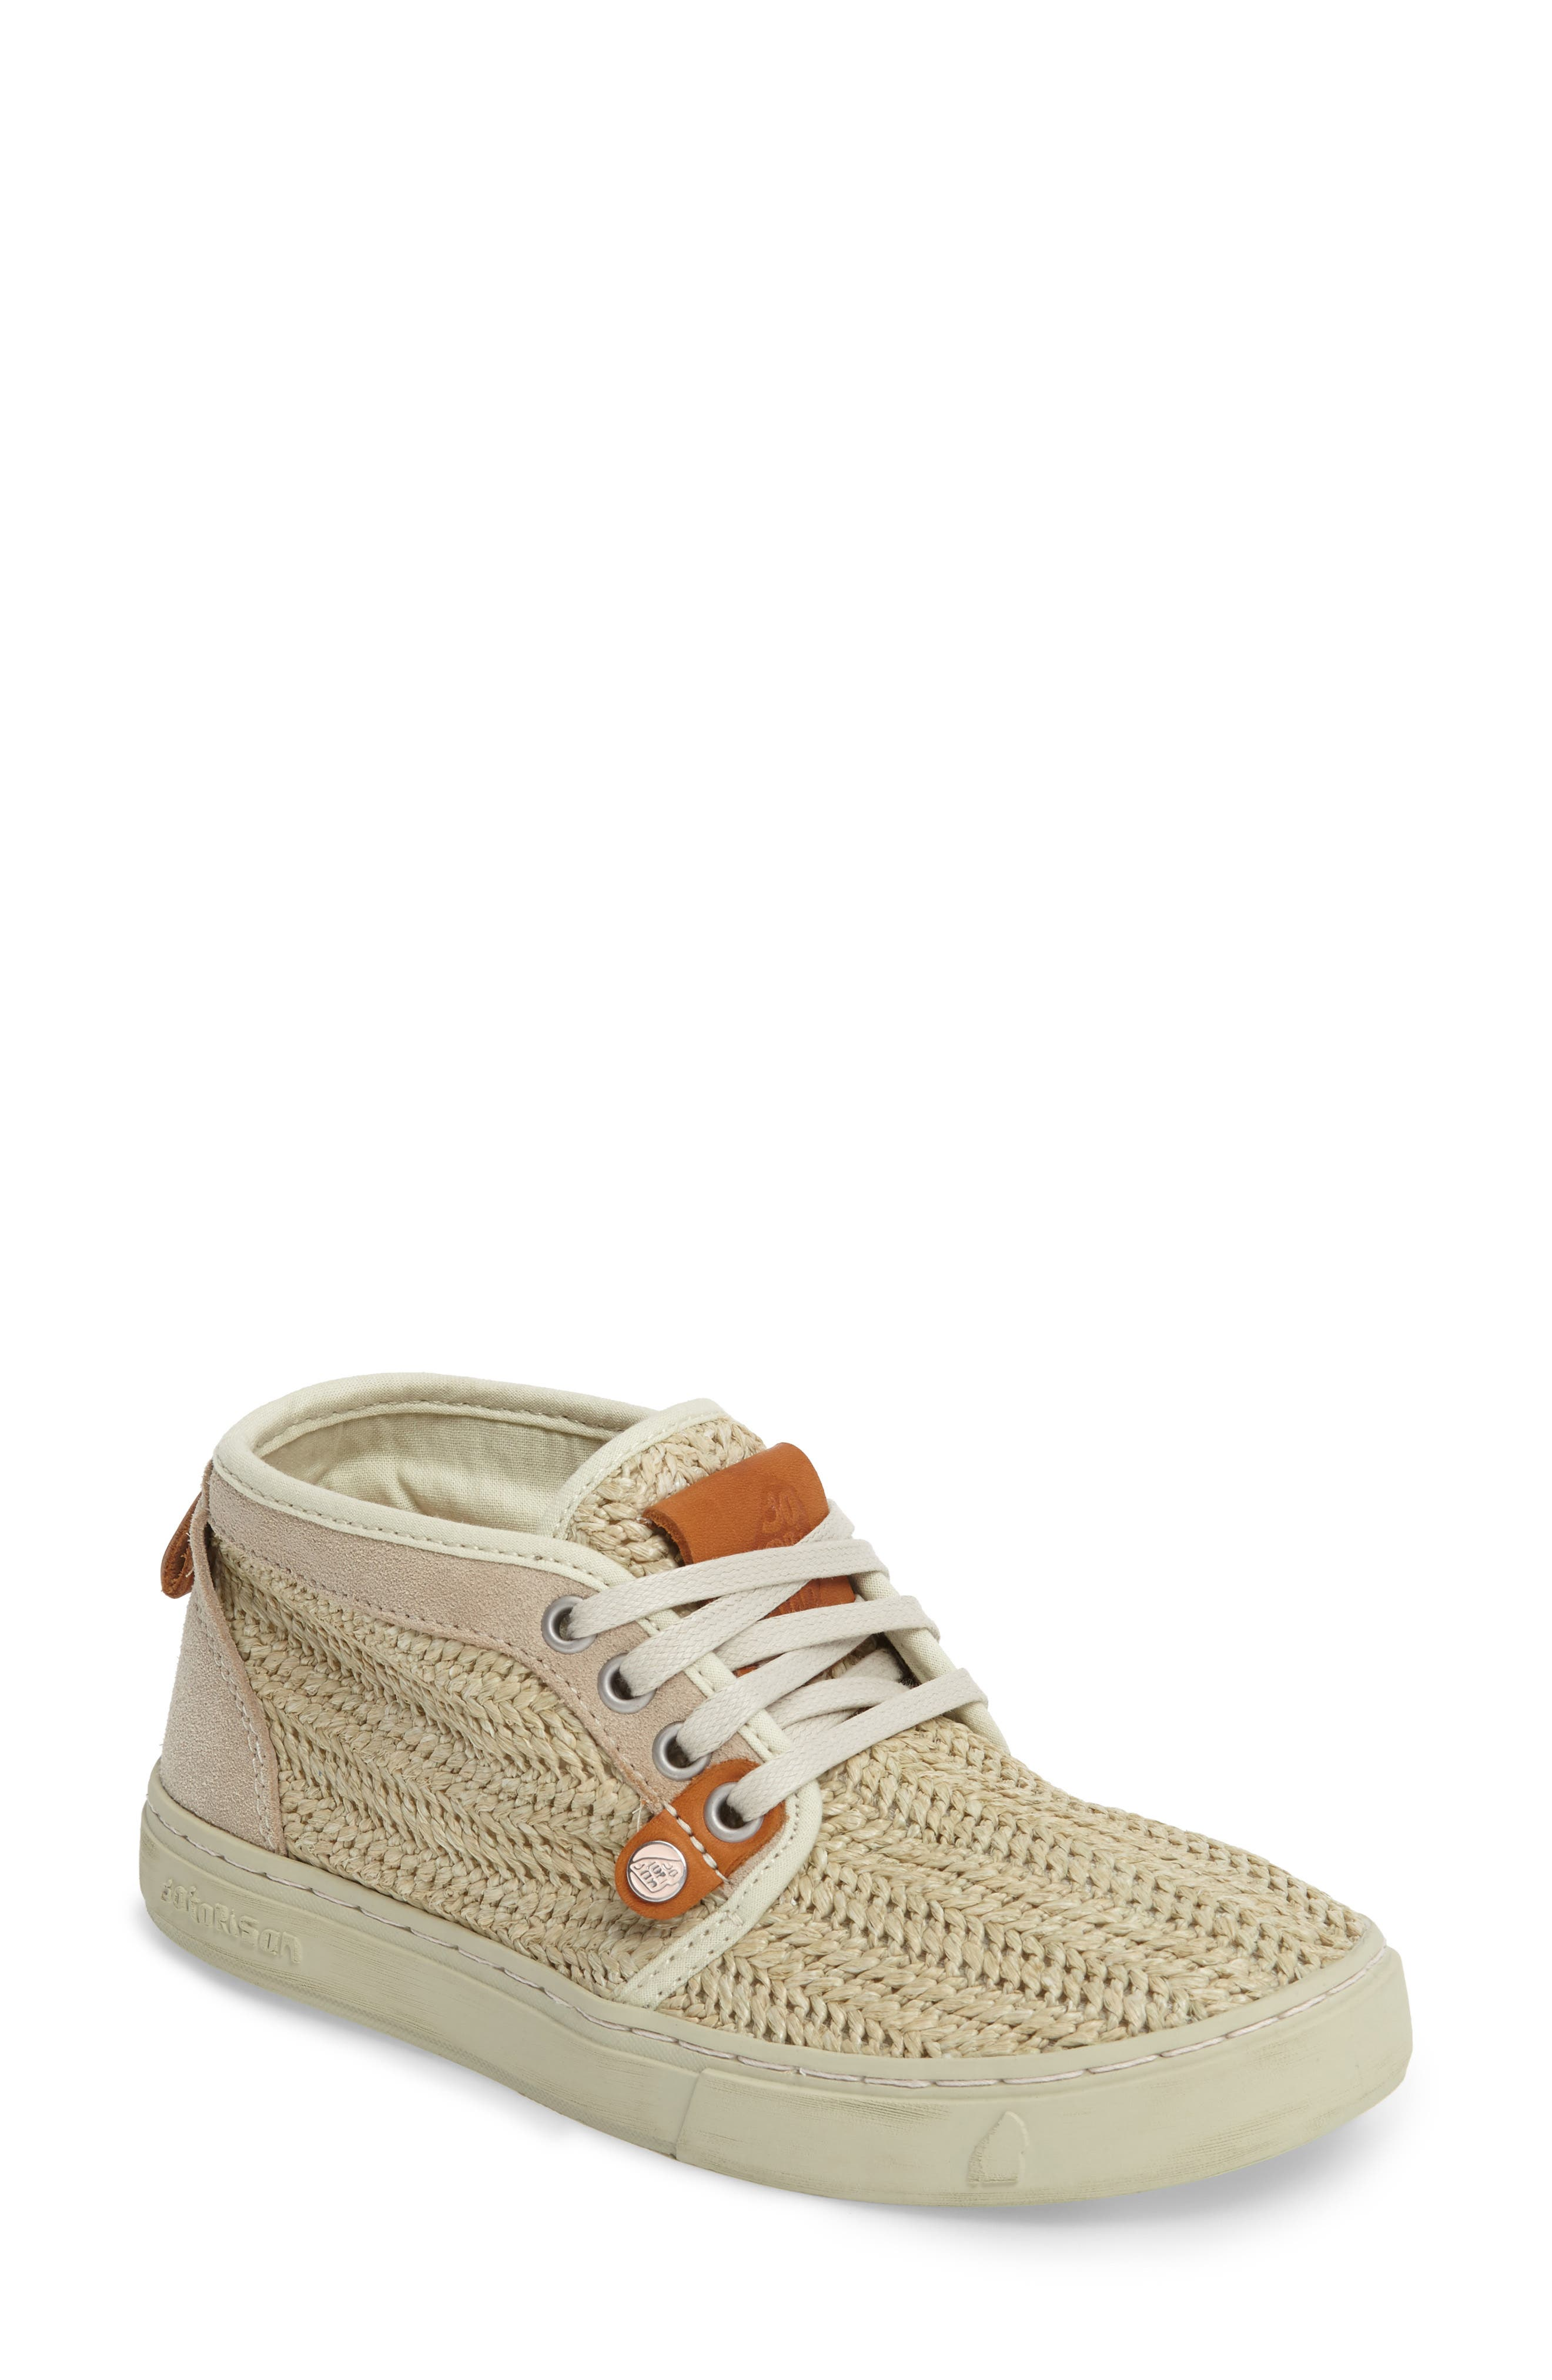 Hamoru Woven High Top Sneaker,                             Main thumbnail 1, color,                             YESO FABRIC